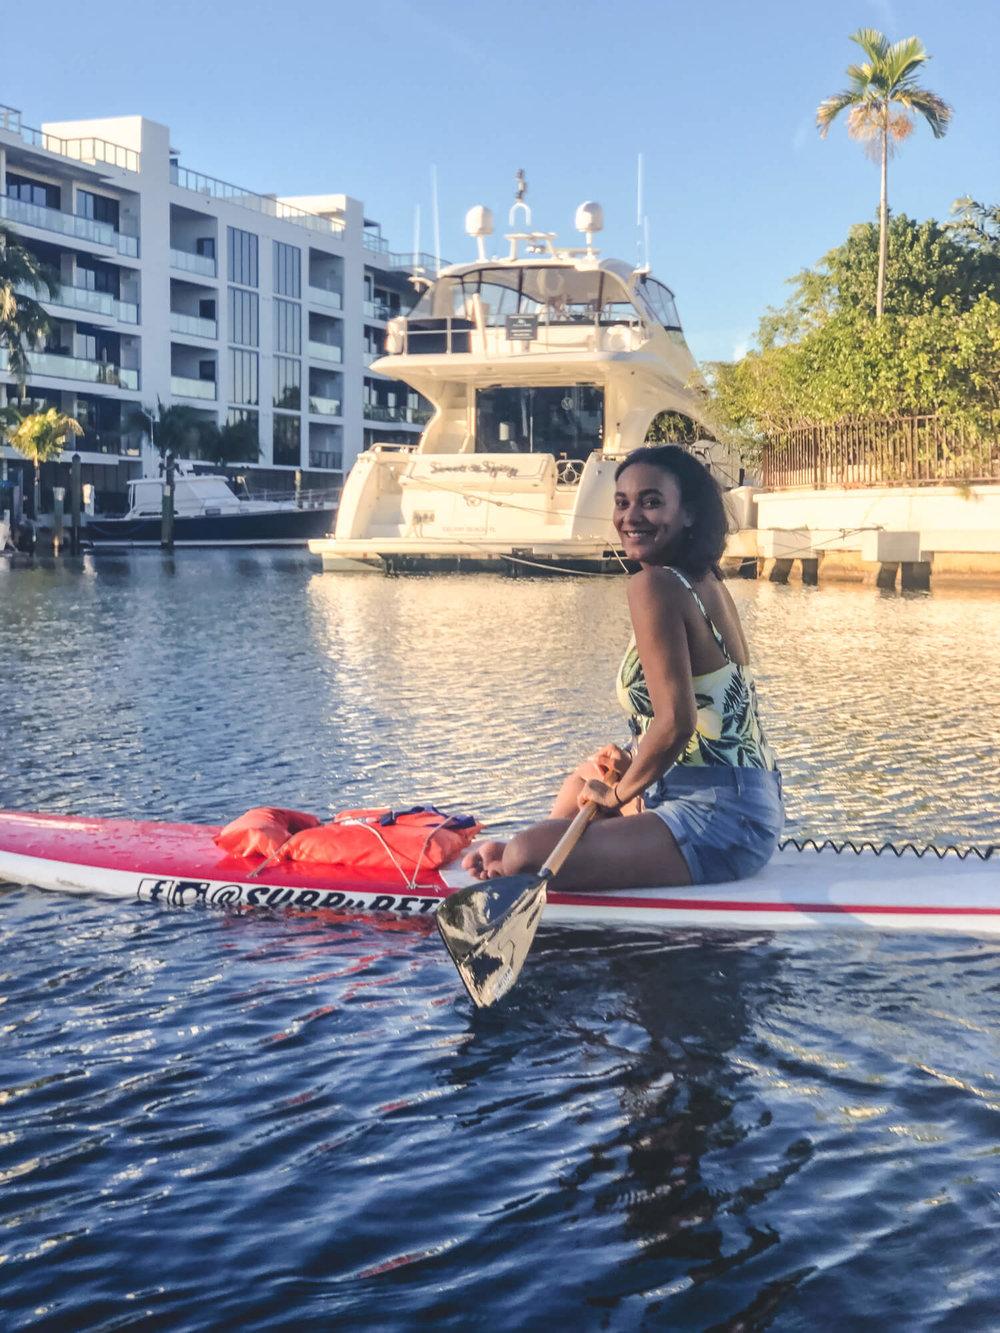 SUP Fort Lauderdale paddle board rentals - ochristine